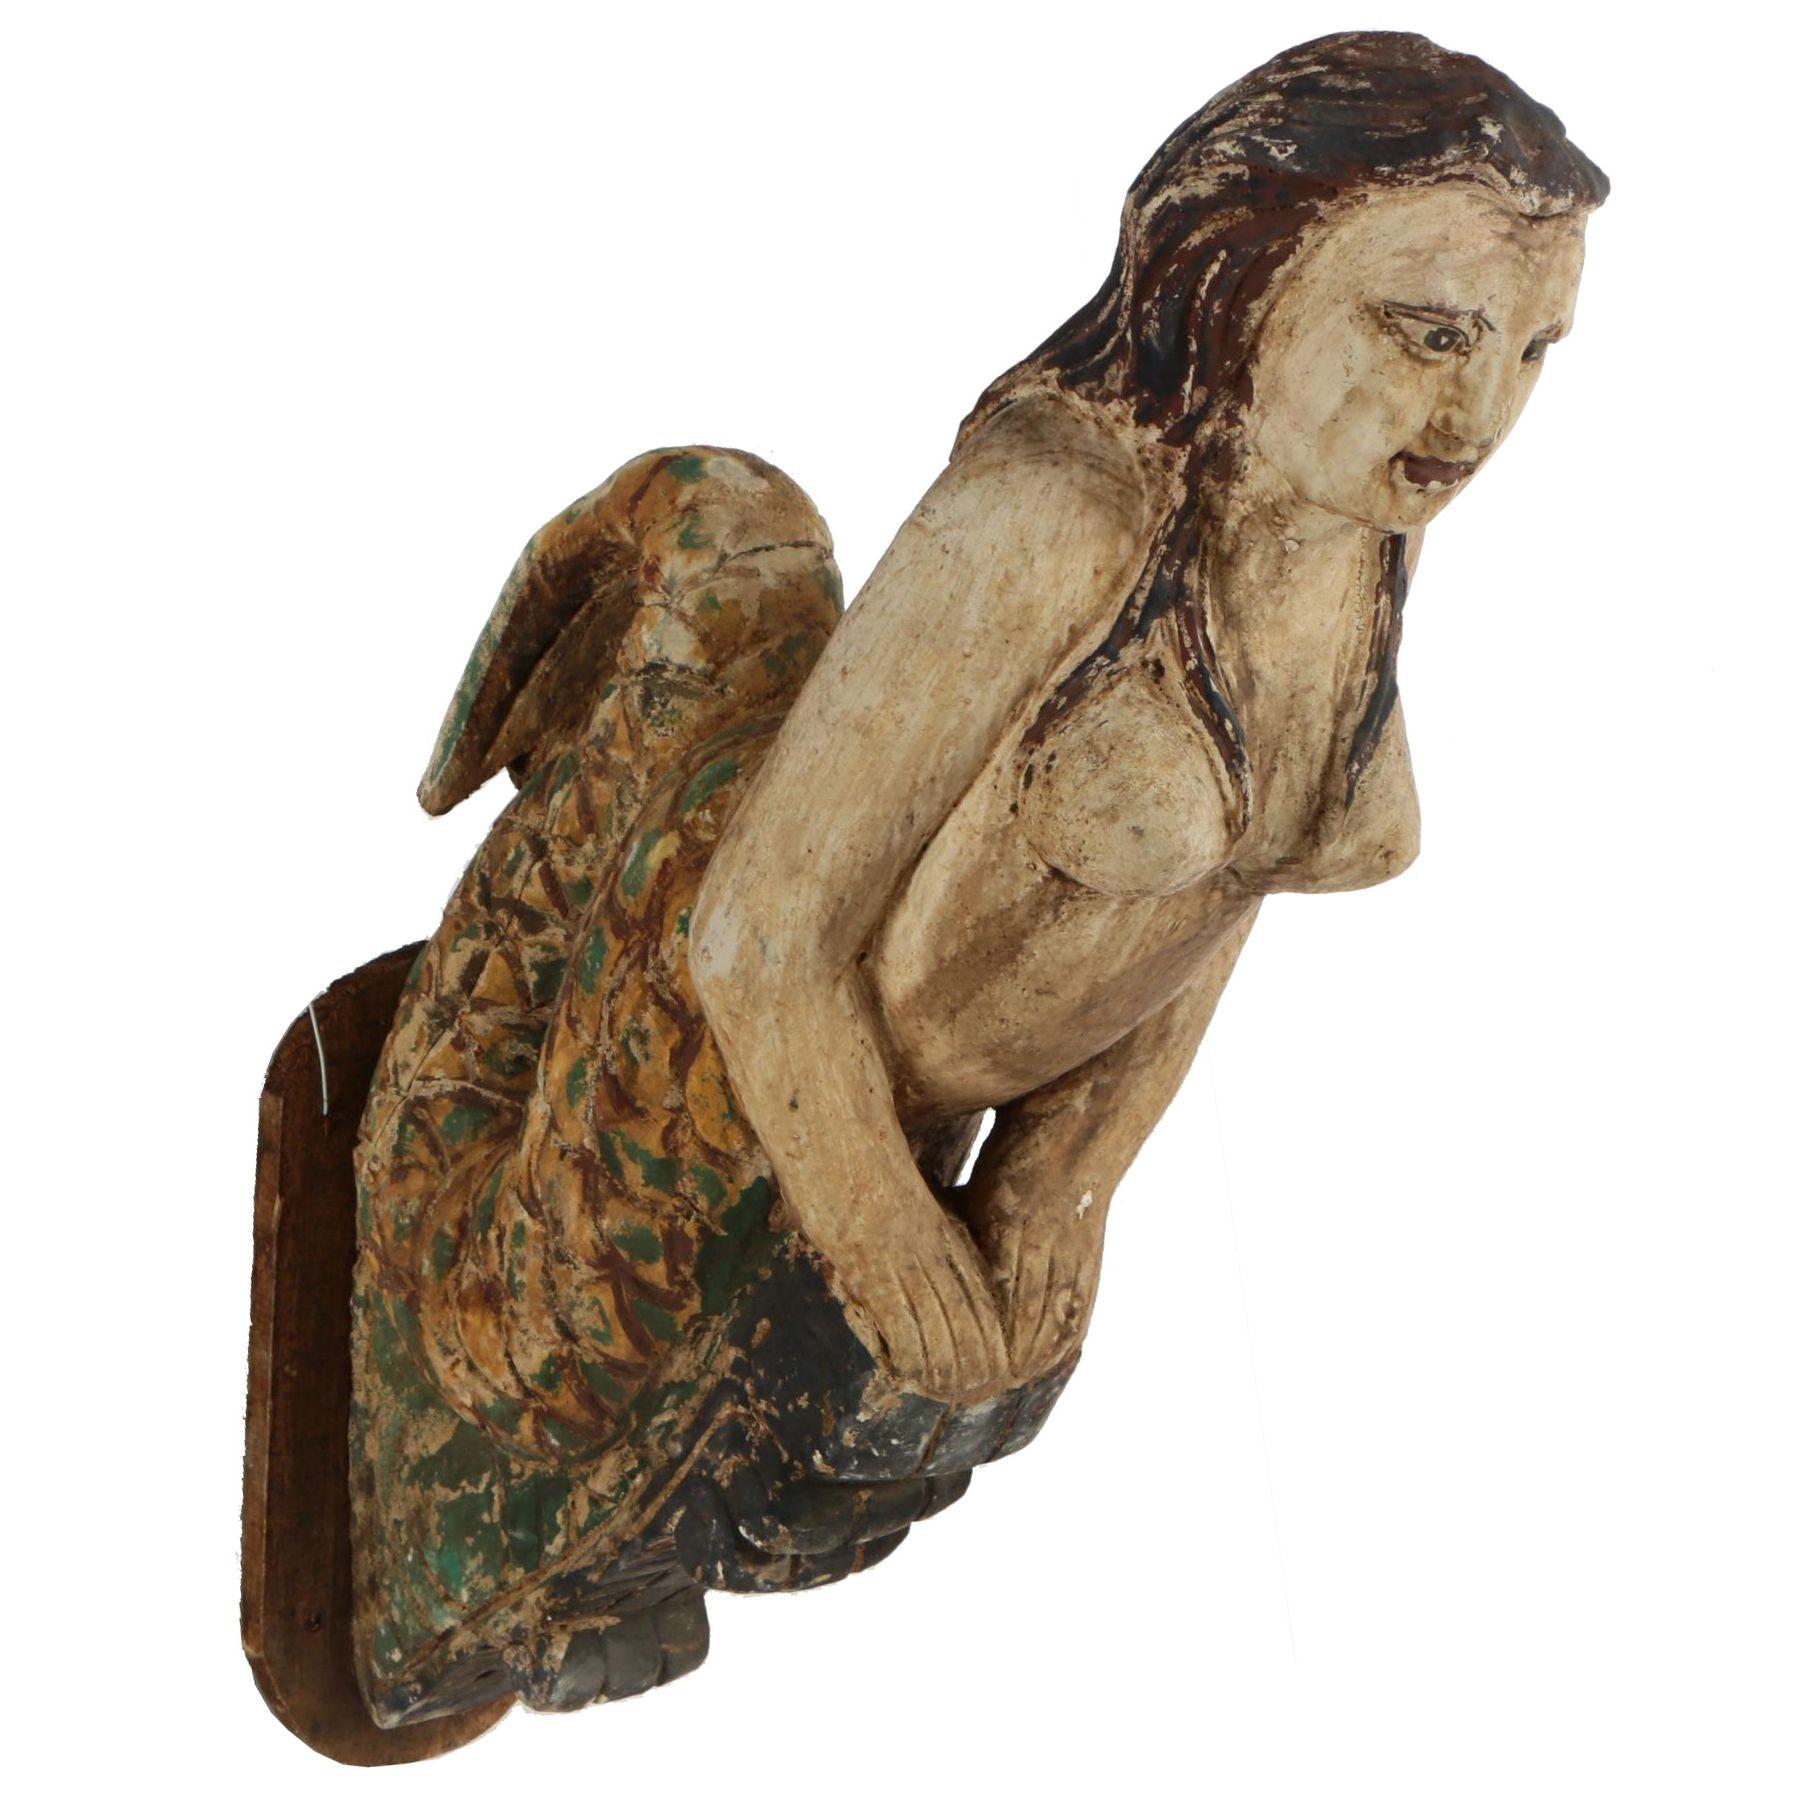 Folk Art Style Carved and Polychromed Wooden Mermaid Figurhead